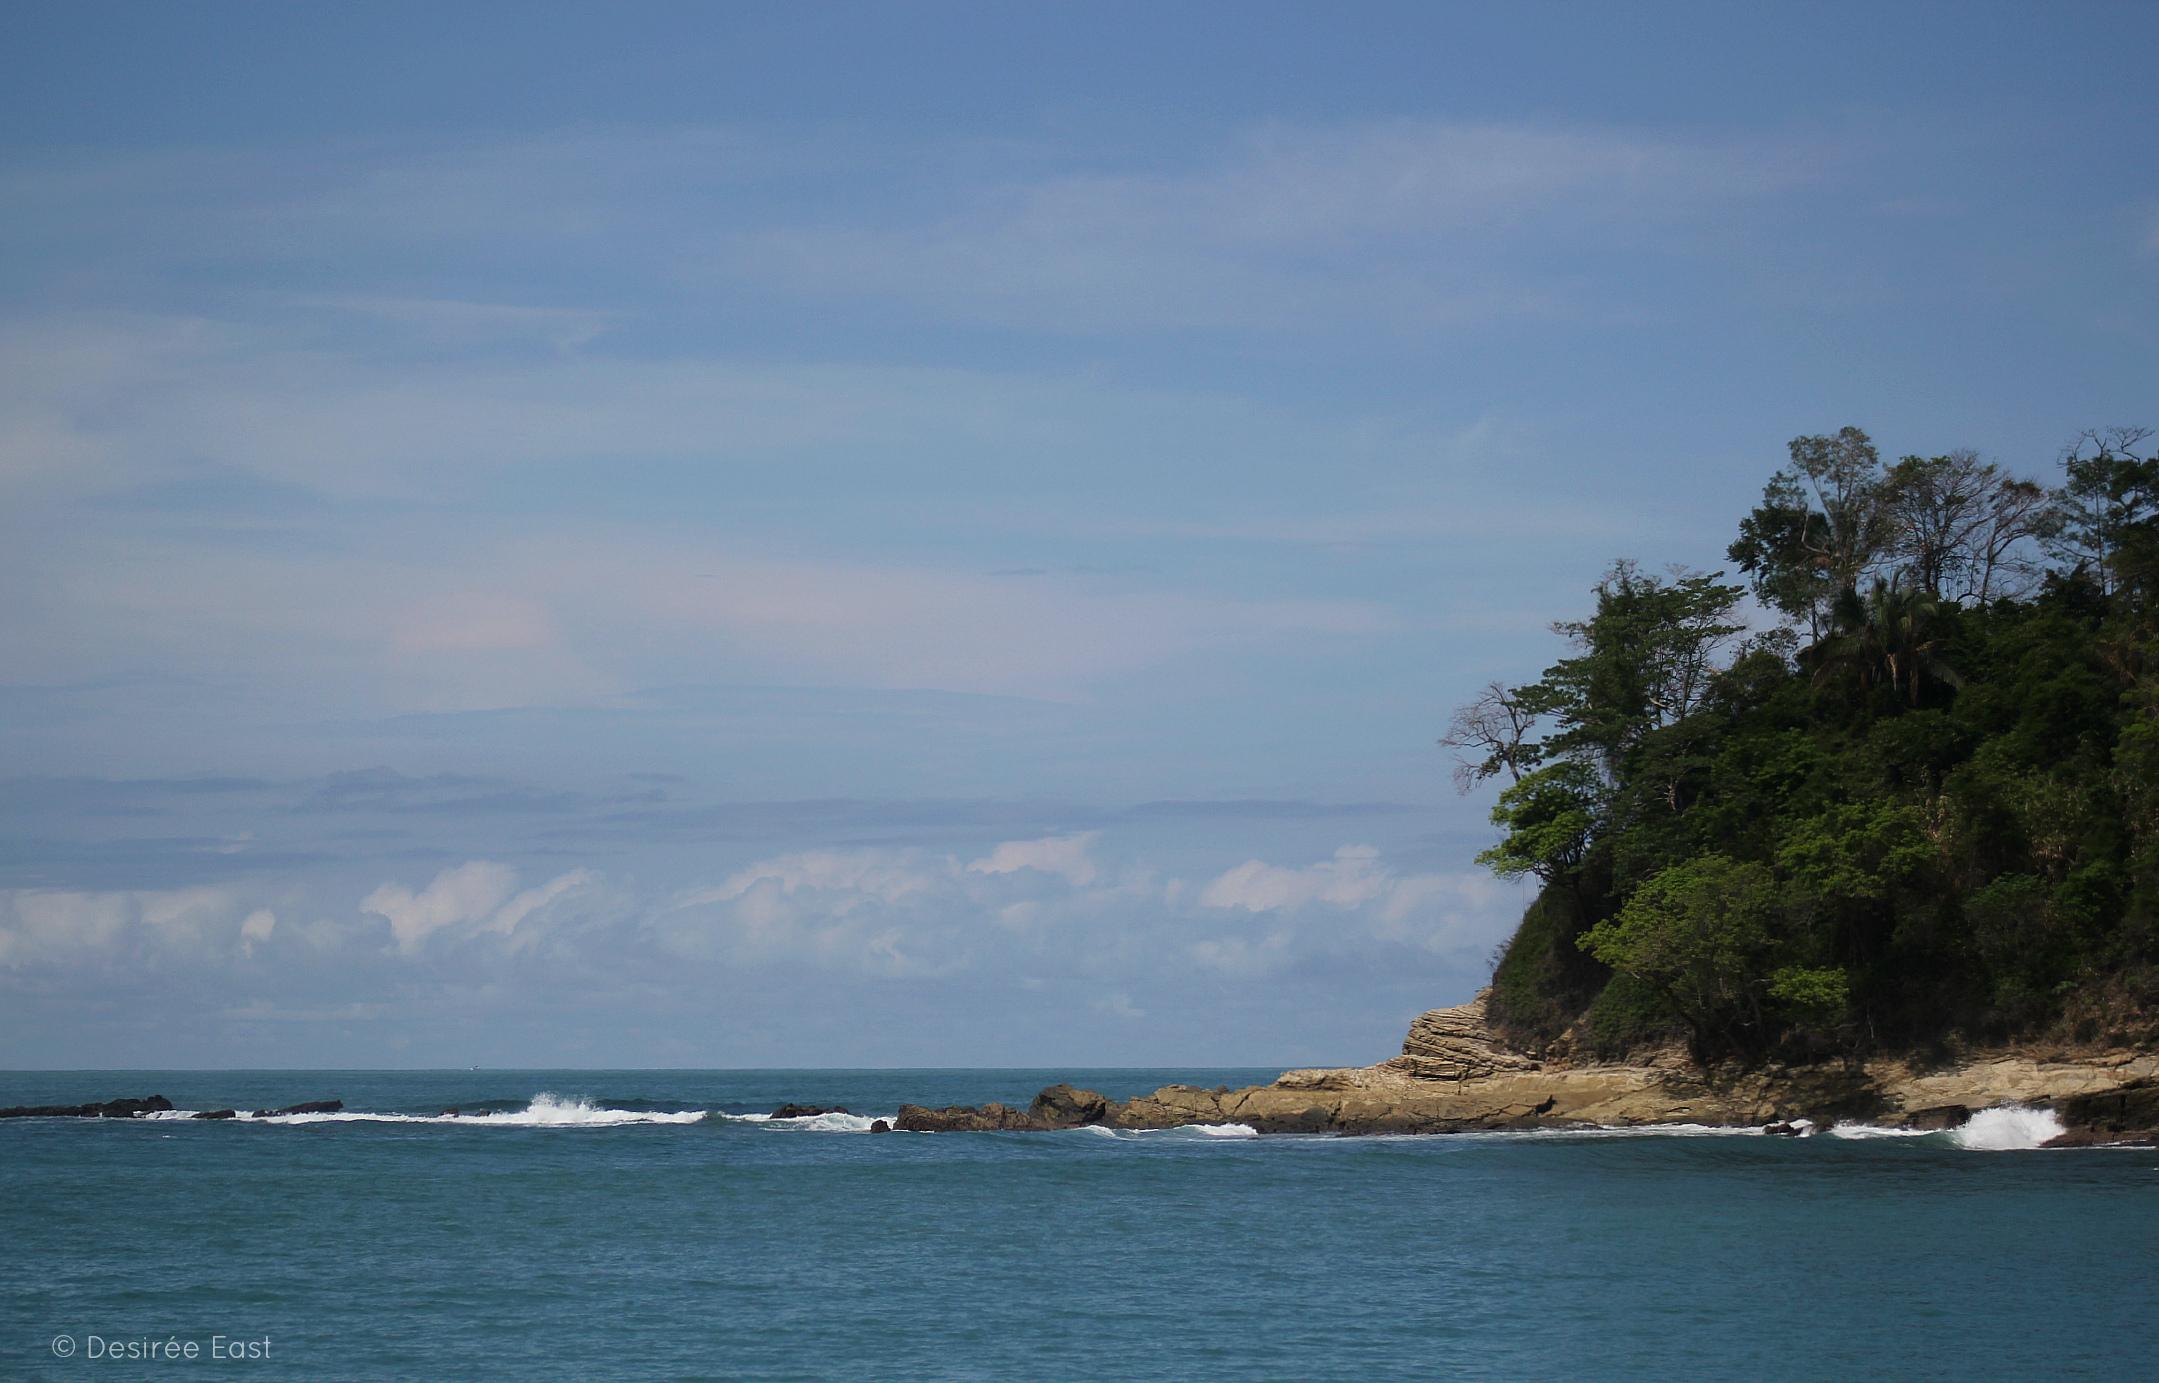 costa-rica-2014-desiree-east-2.jpg